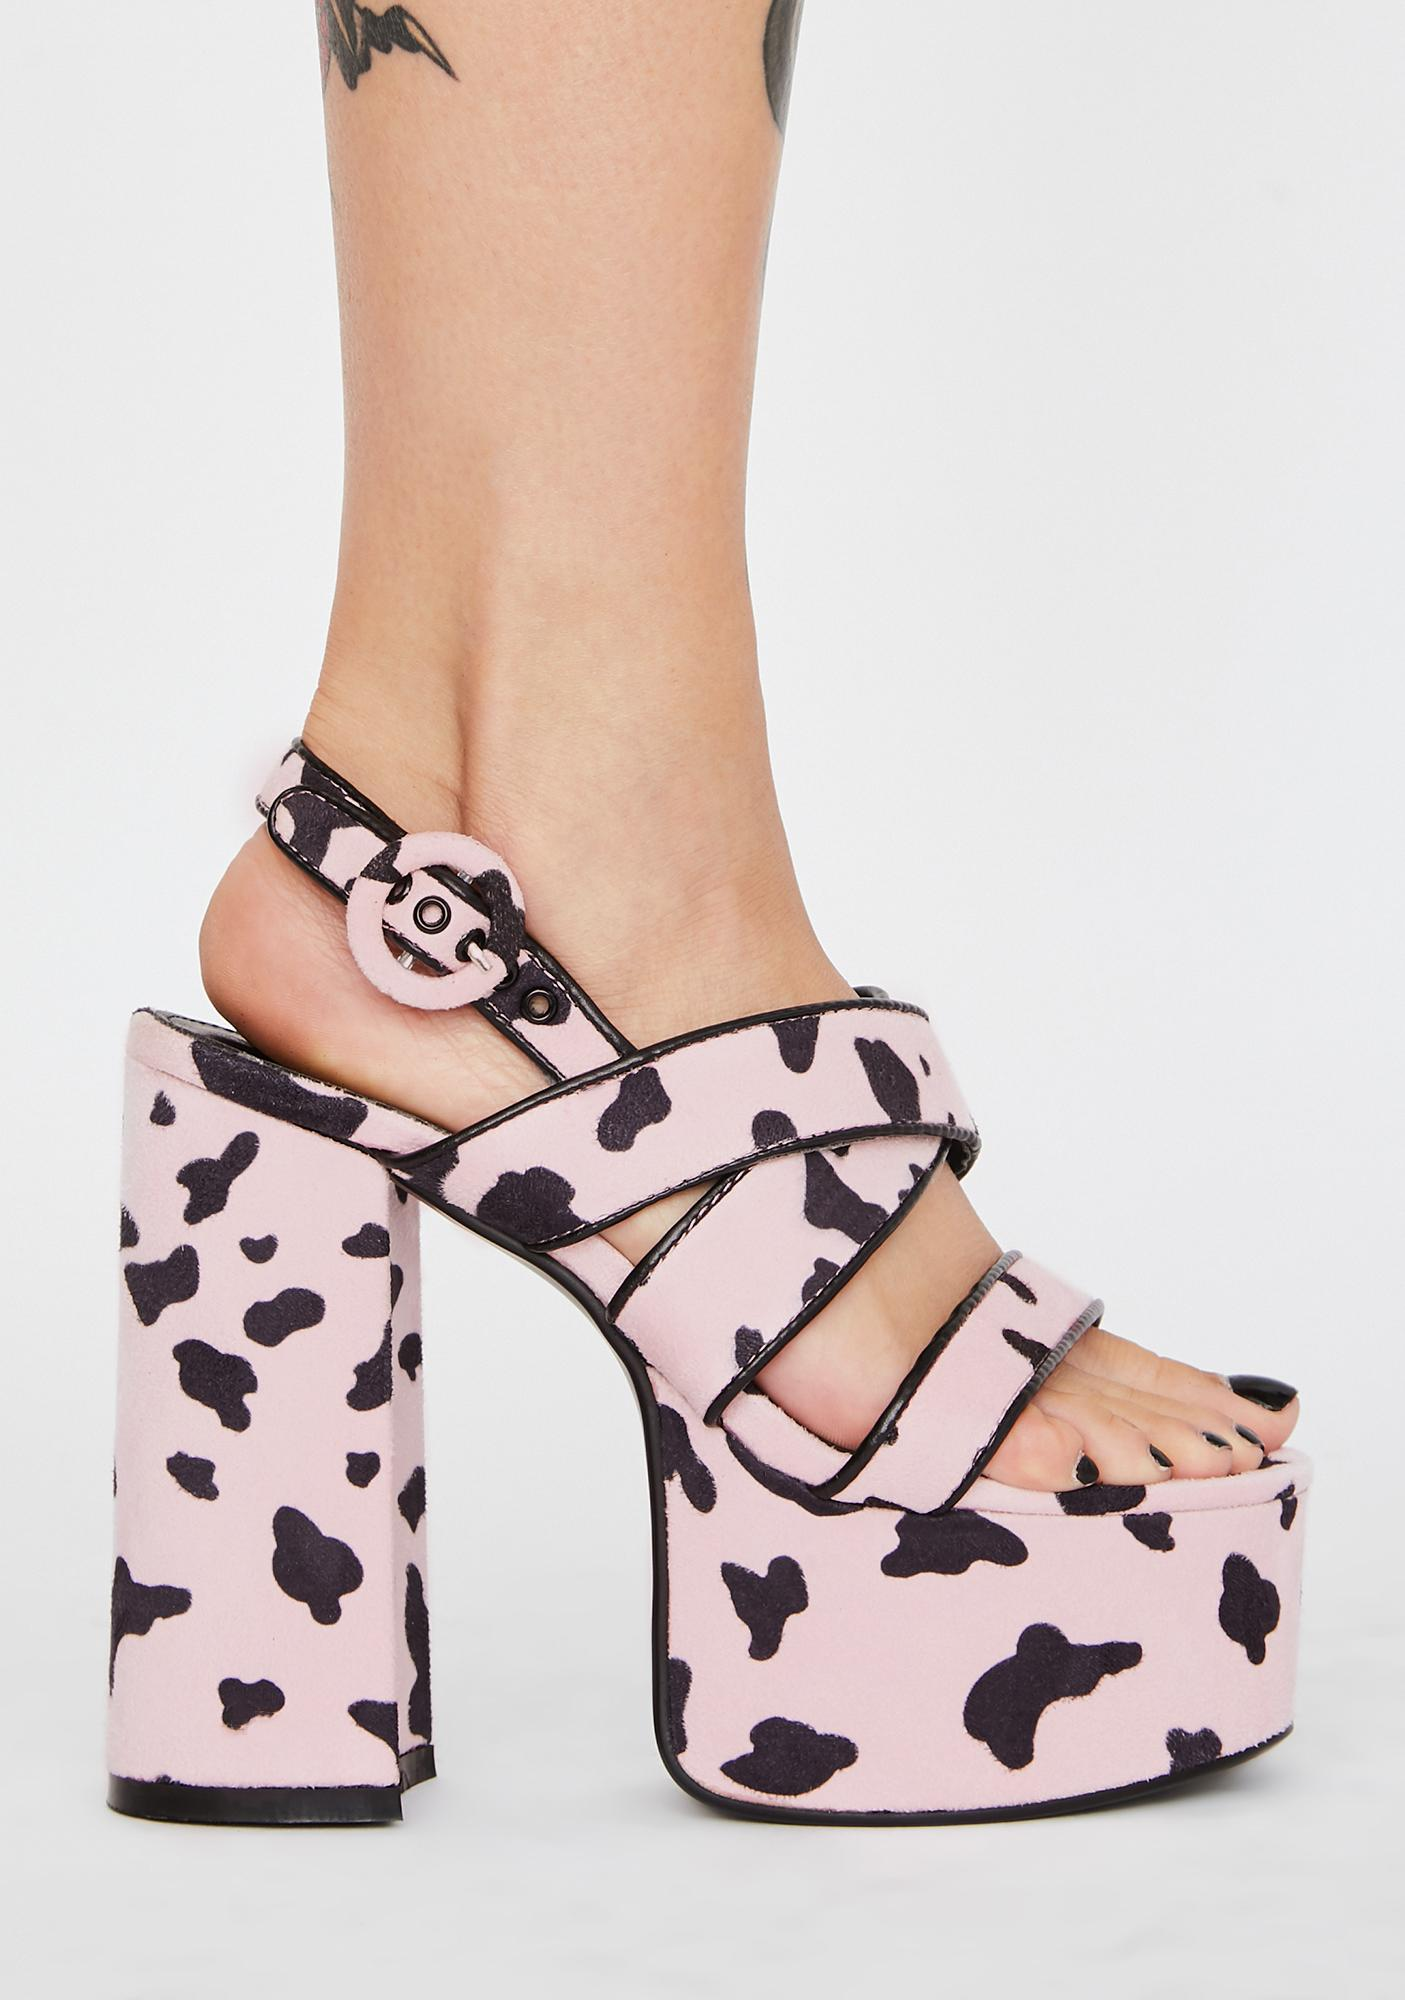 Lamoda Sugar Udderly Chic Chunky Heels